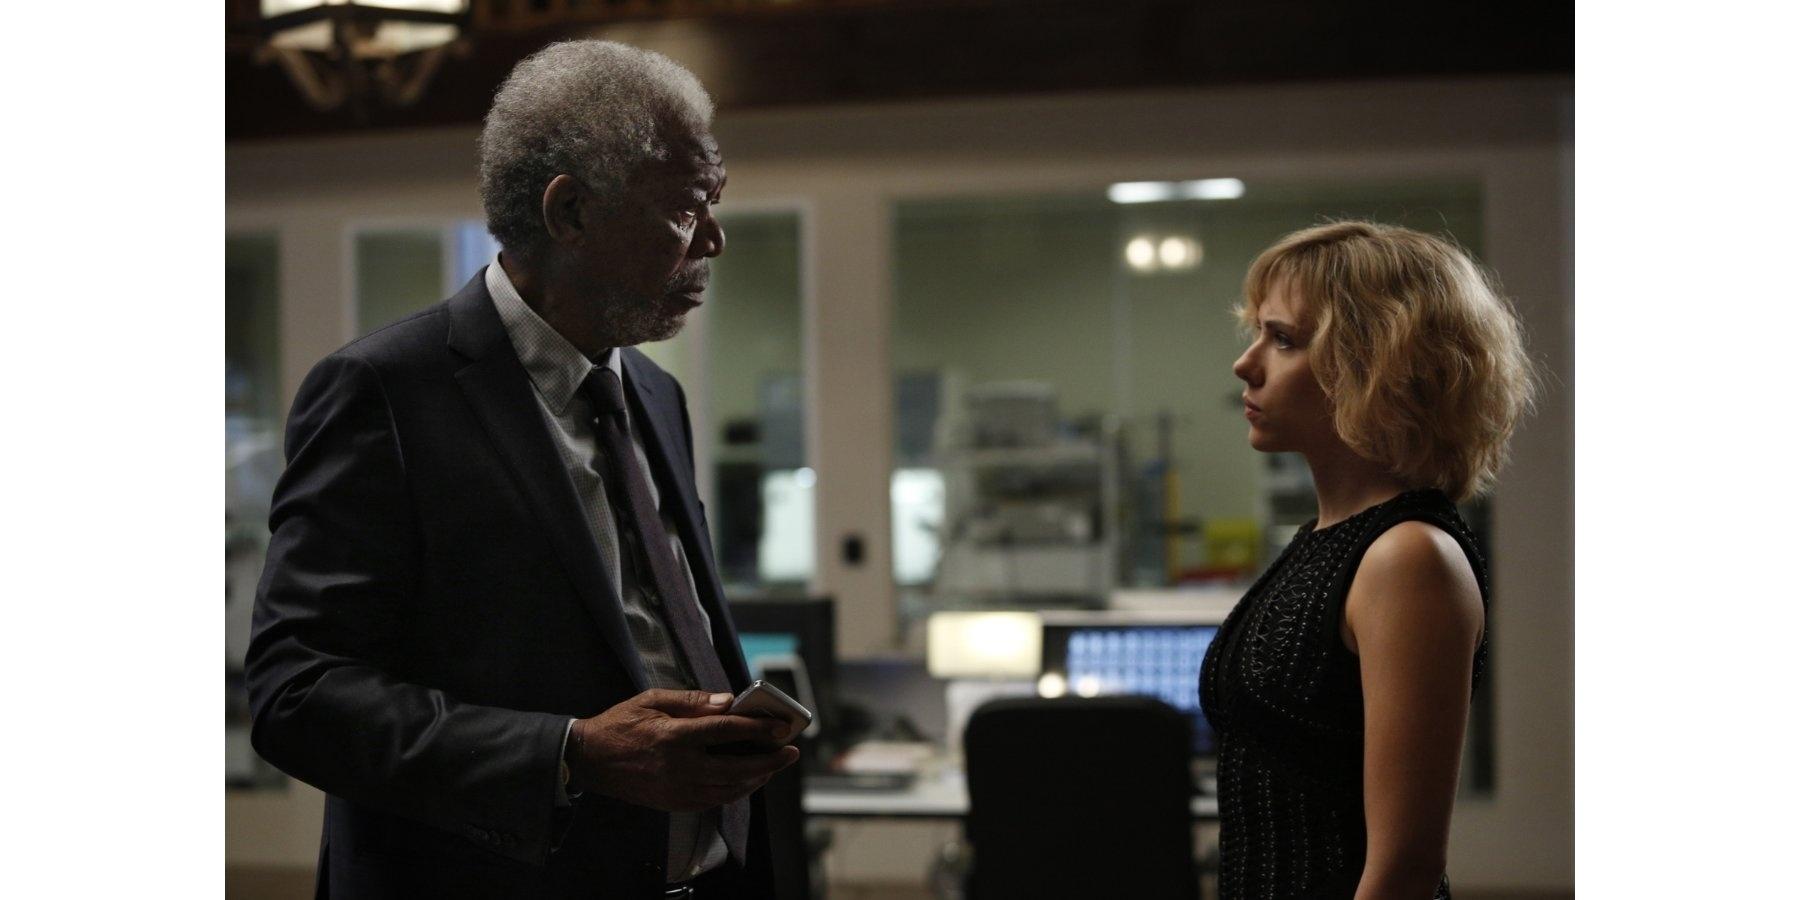 Morgan Freeman e Scarlett Johansson em cena de